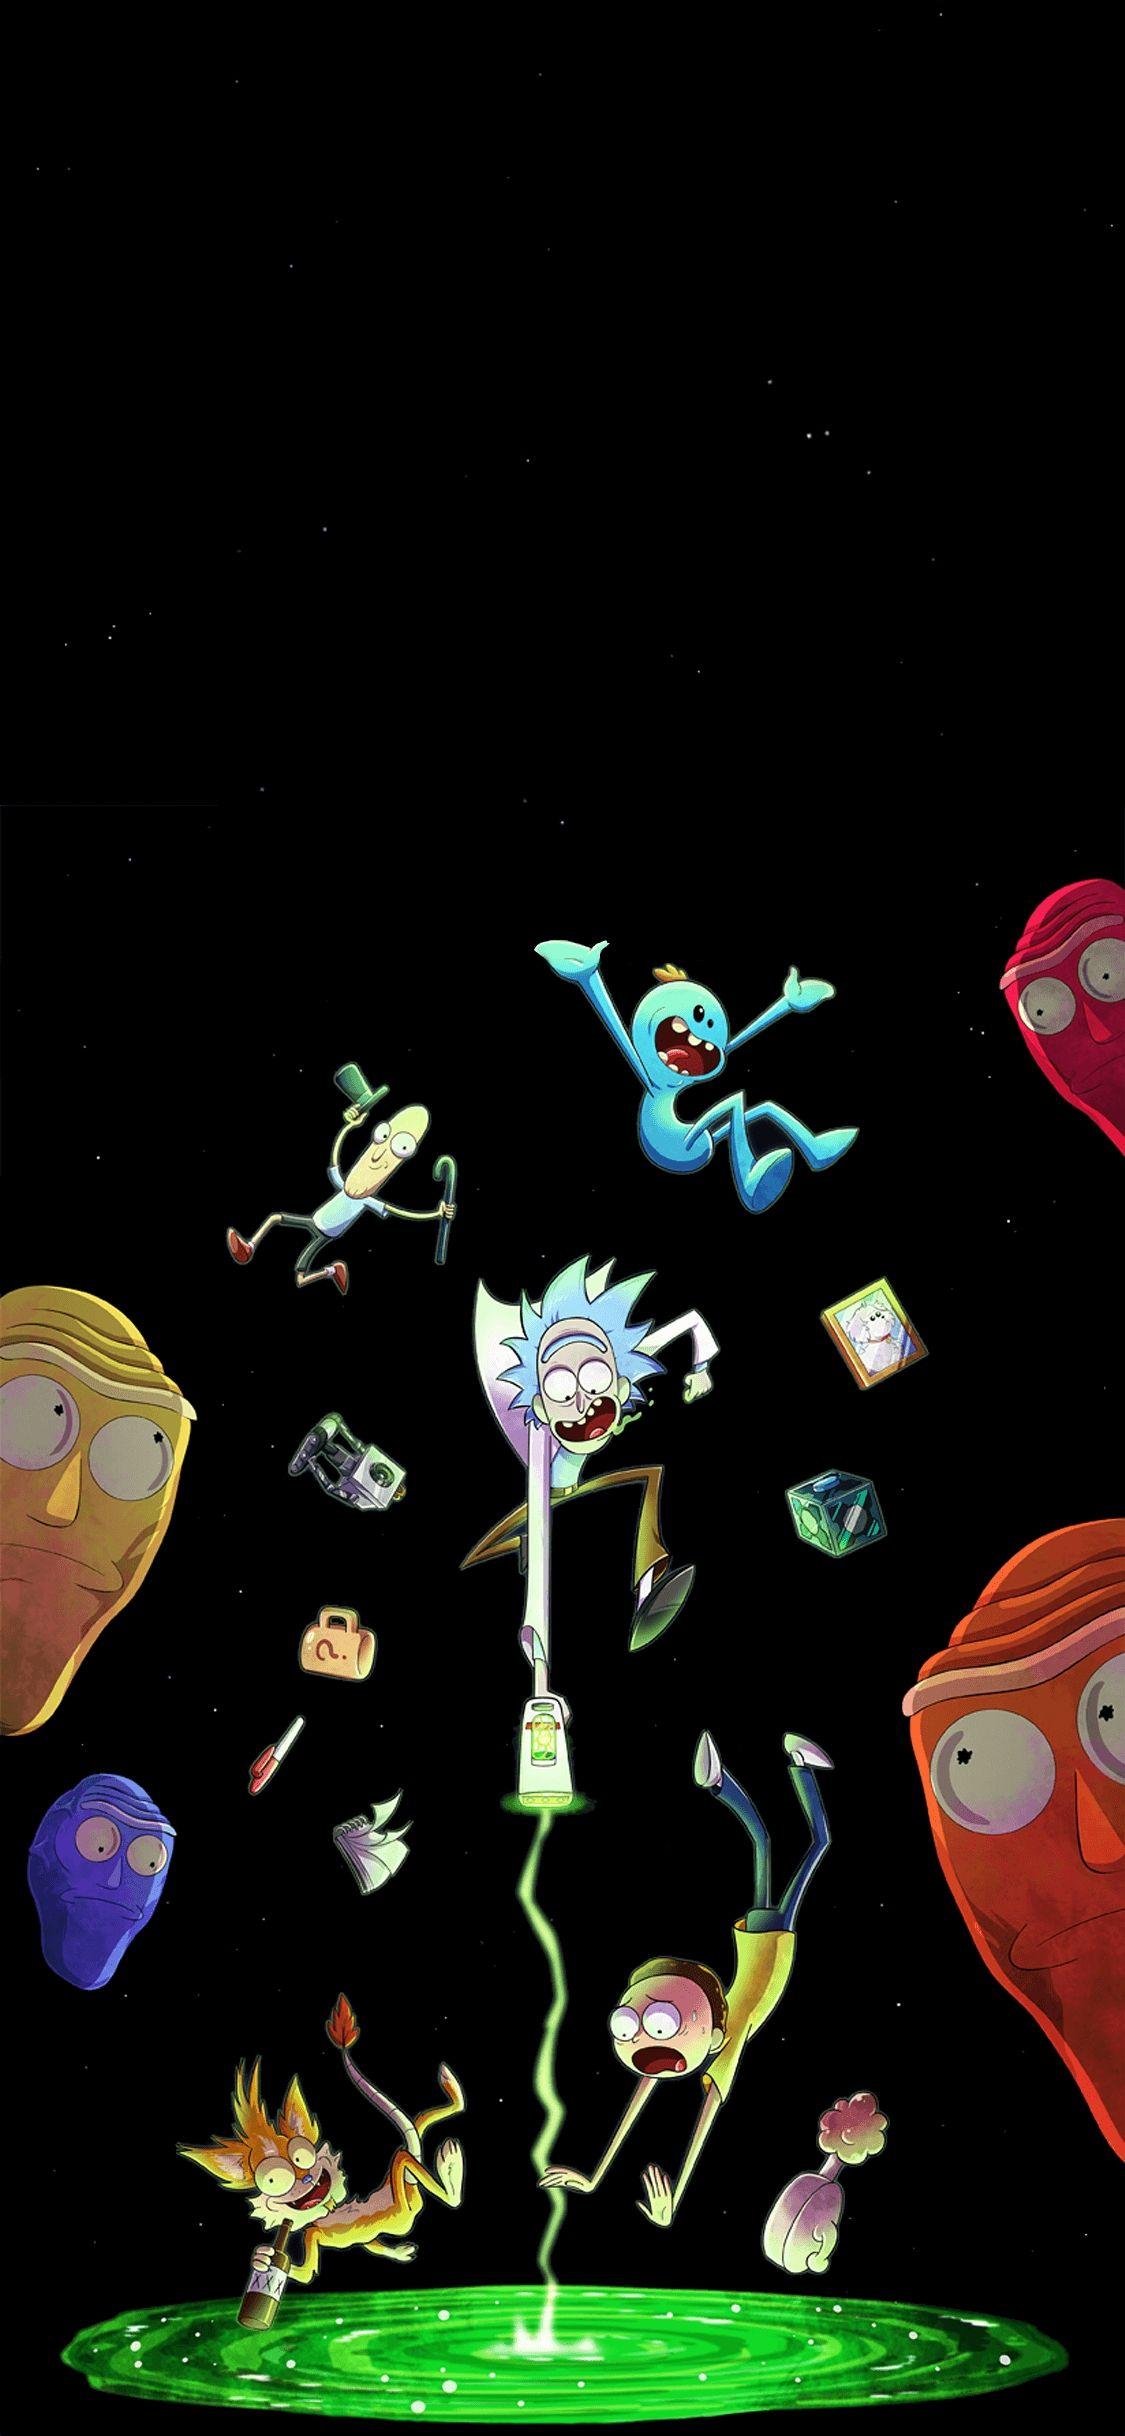 Rick And Morty Iphone Wallpapers Top Free Rick And Morty Pertaining To The Mo Em 2020 Imagem De Fundo Para Iphone Papel De Parede Supreme Papeis De Parede Psicodelicos